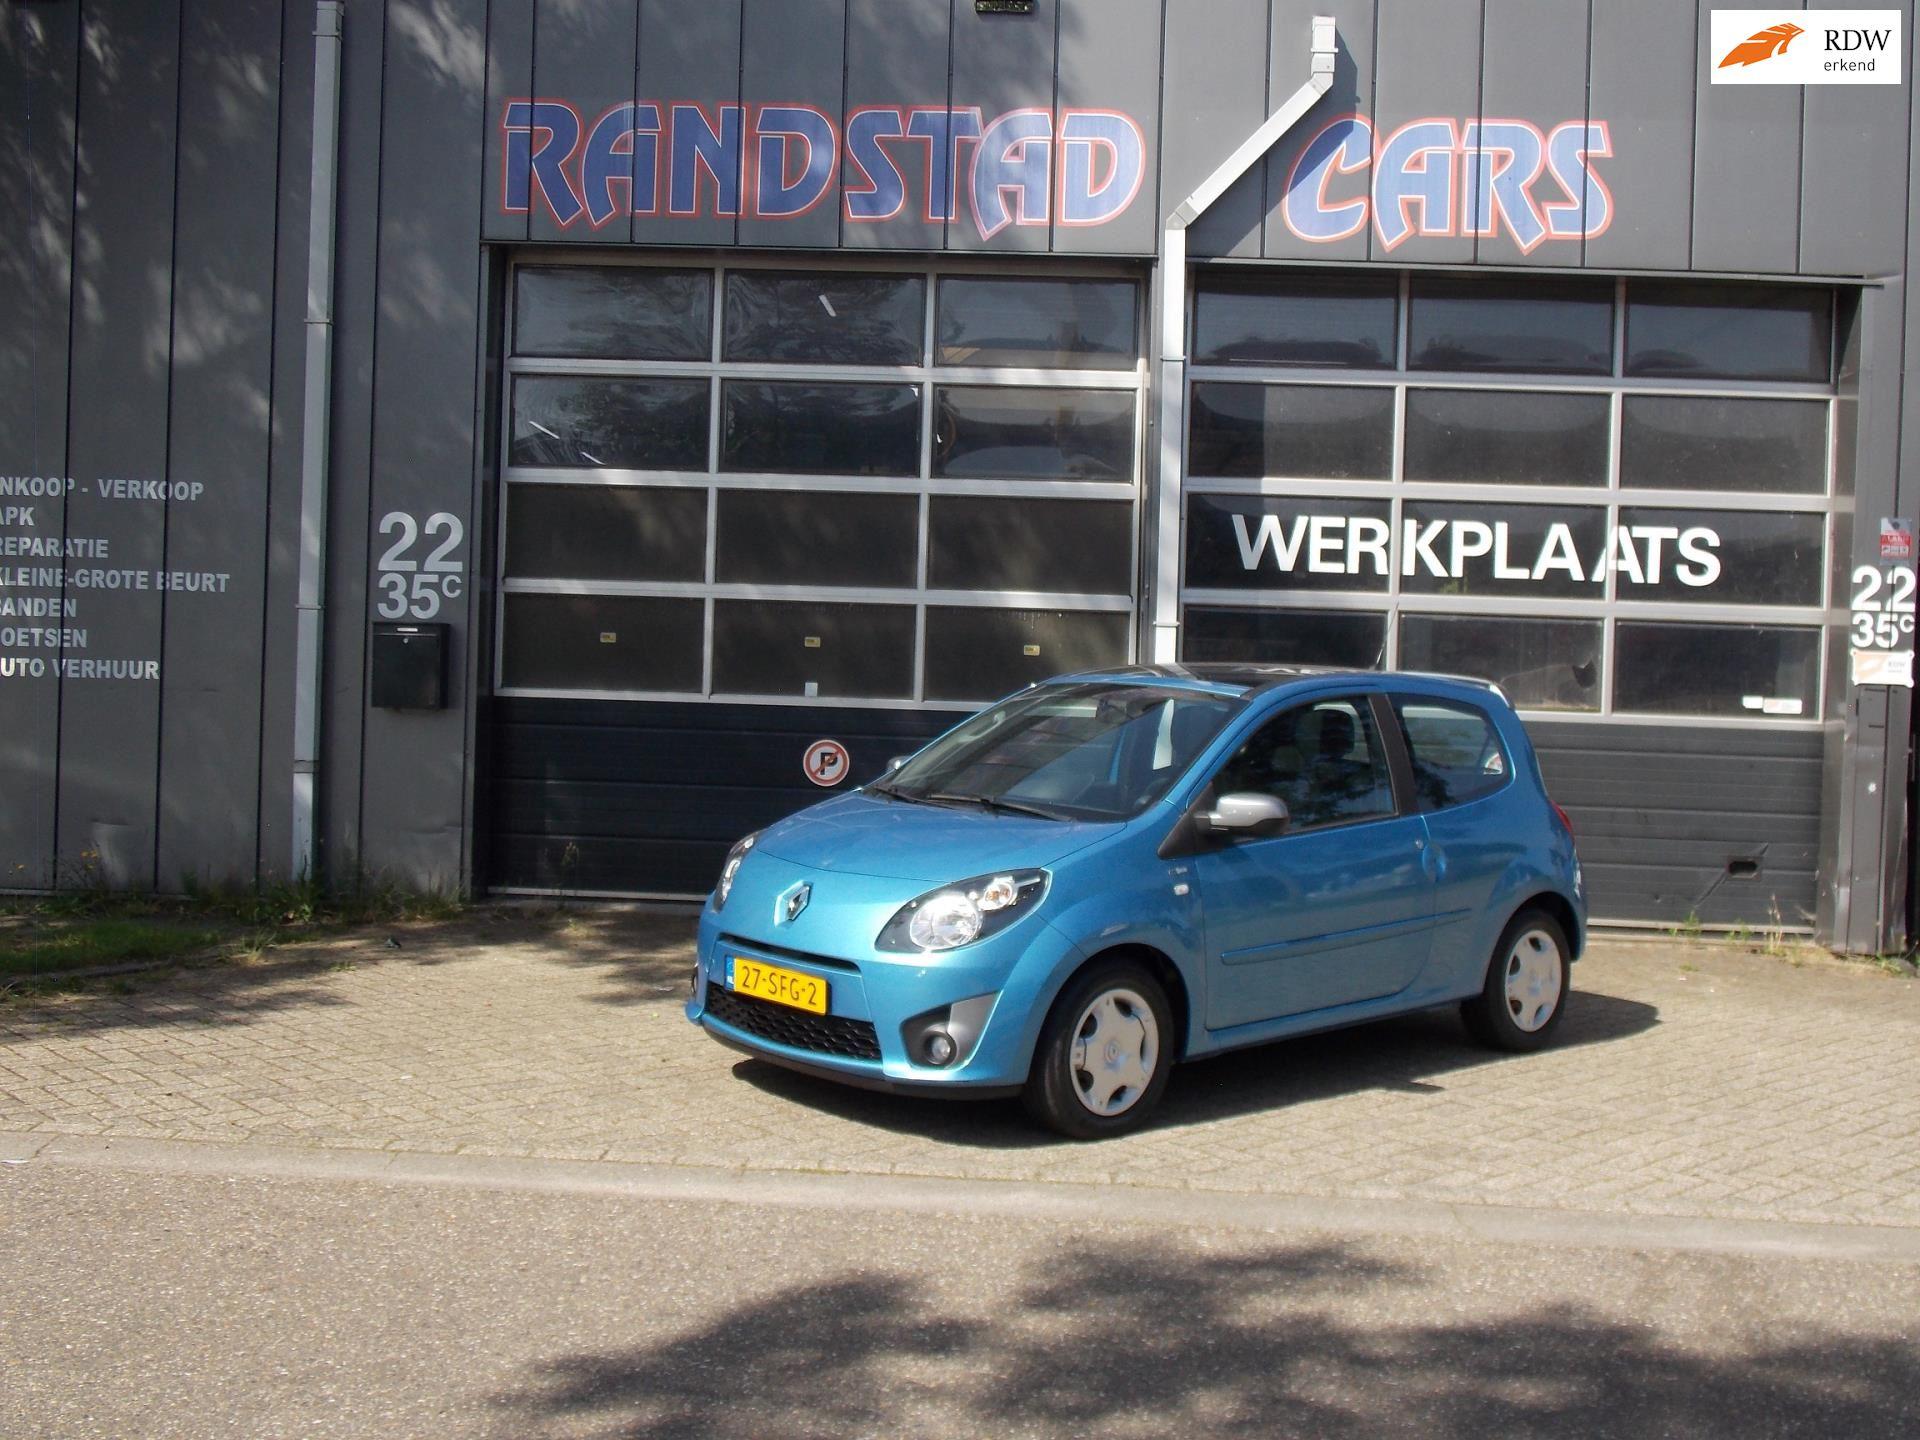 Renault Twingo occasion - Randstad Cars